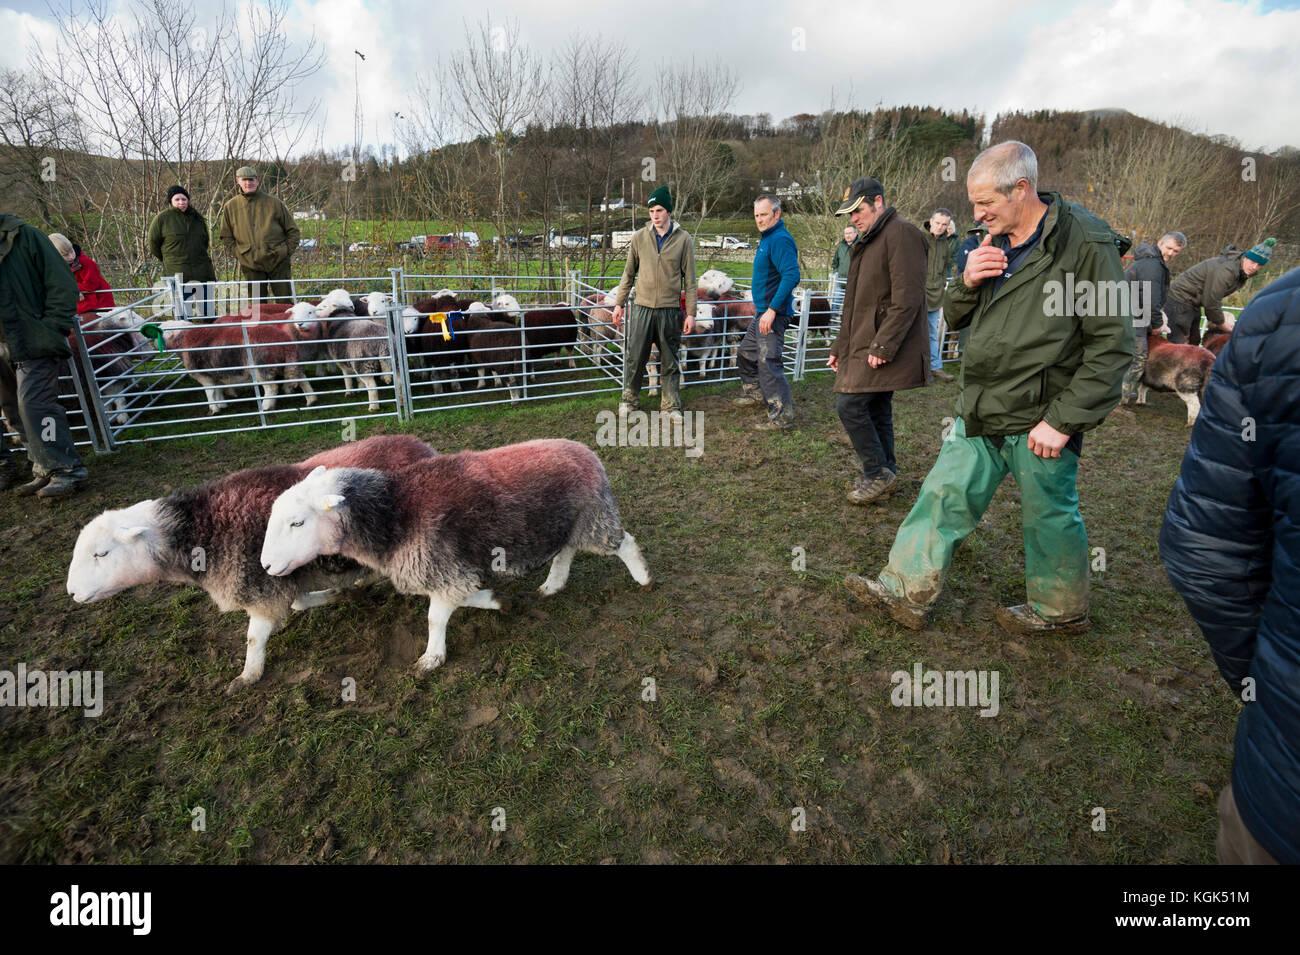 Herdwick sheep being judged, Walna Scar Shepherds Meet, Torver, Cumbria, UK. - Stock Image